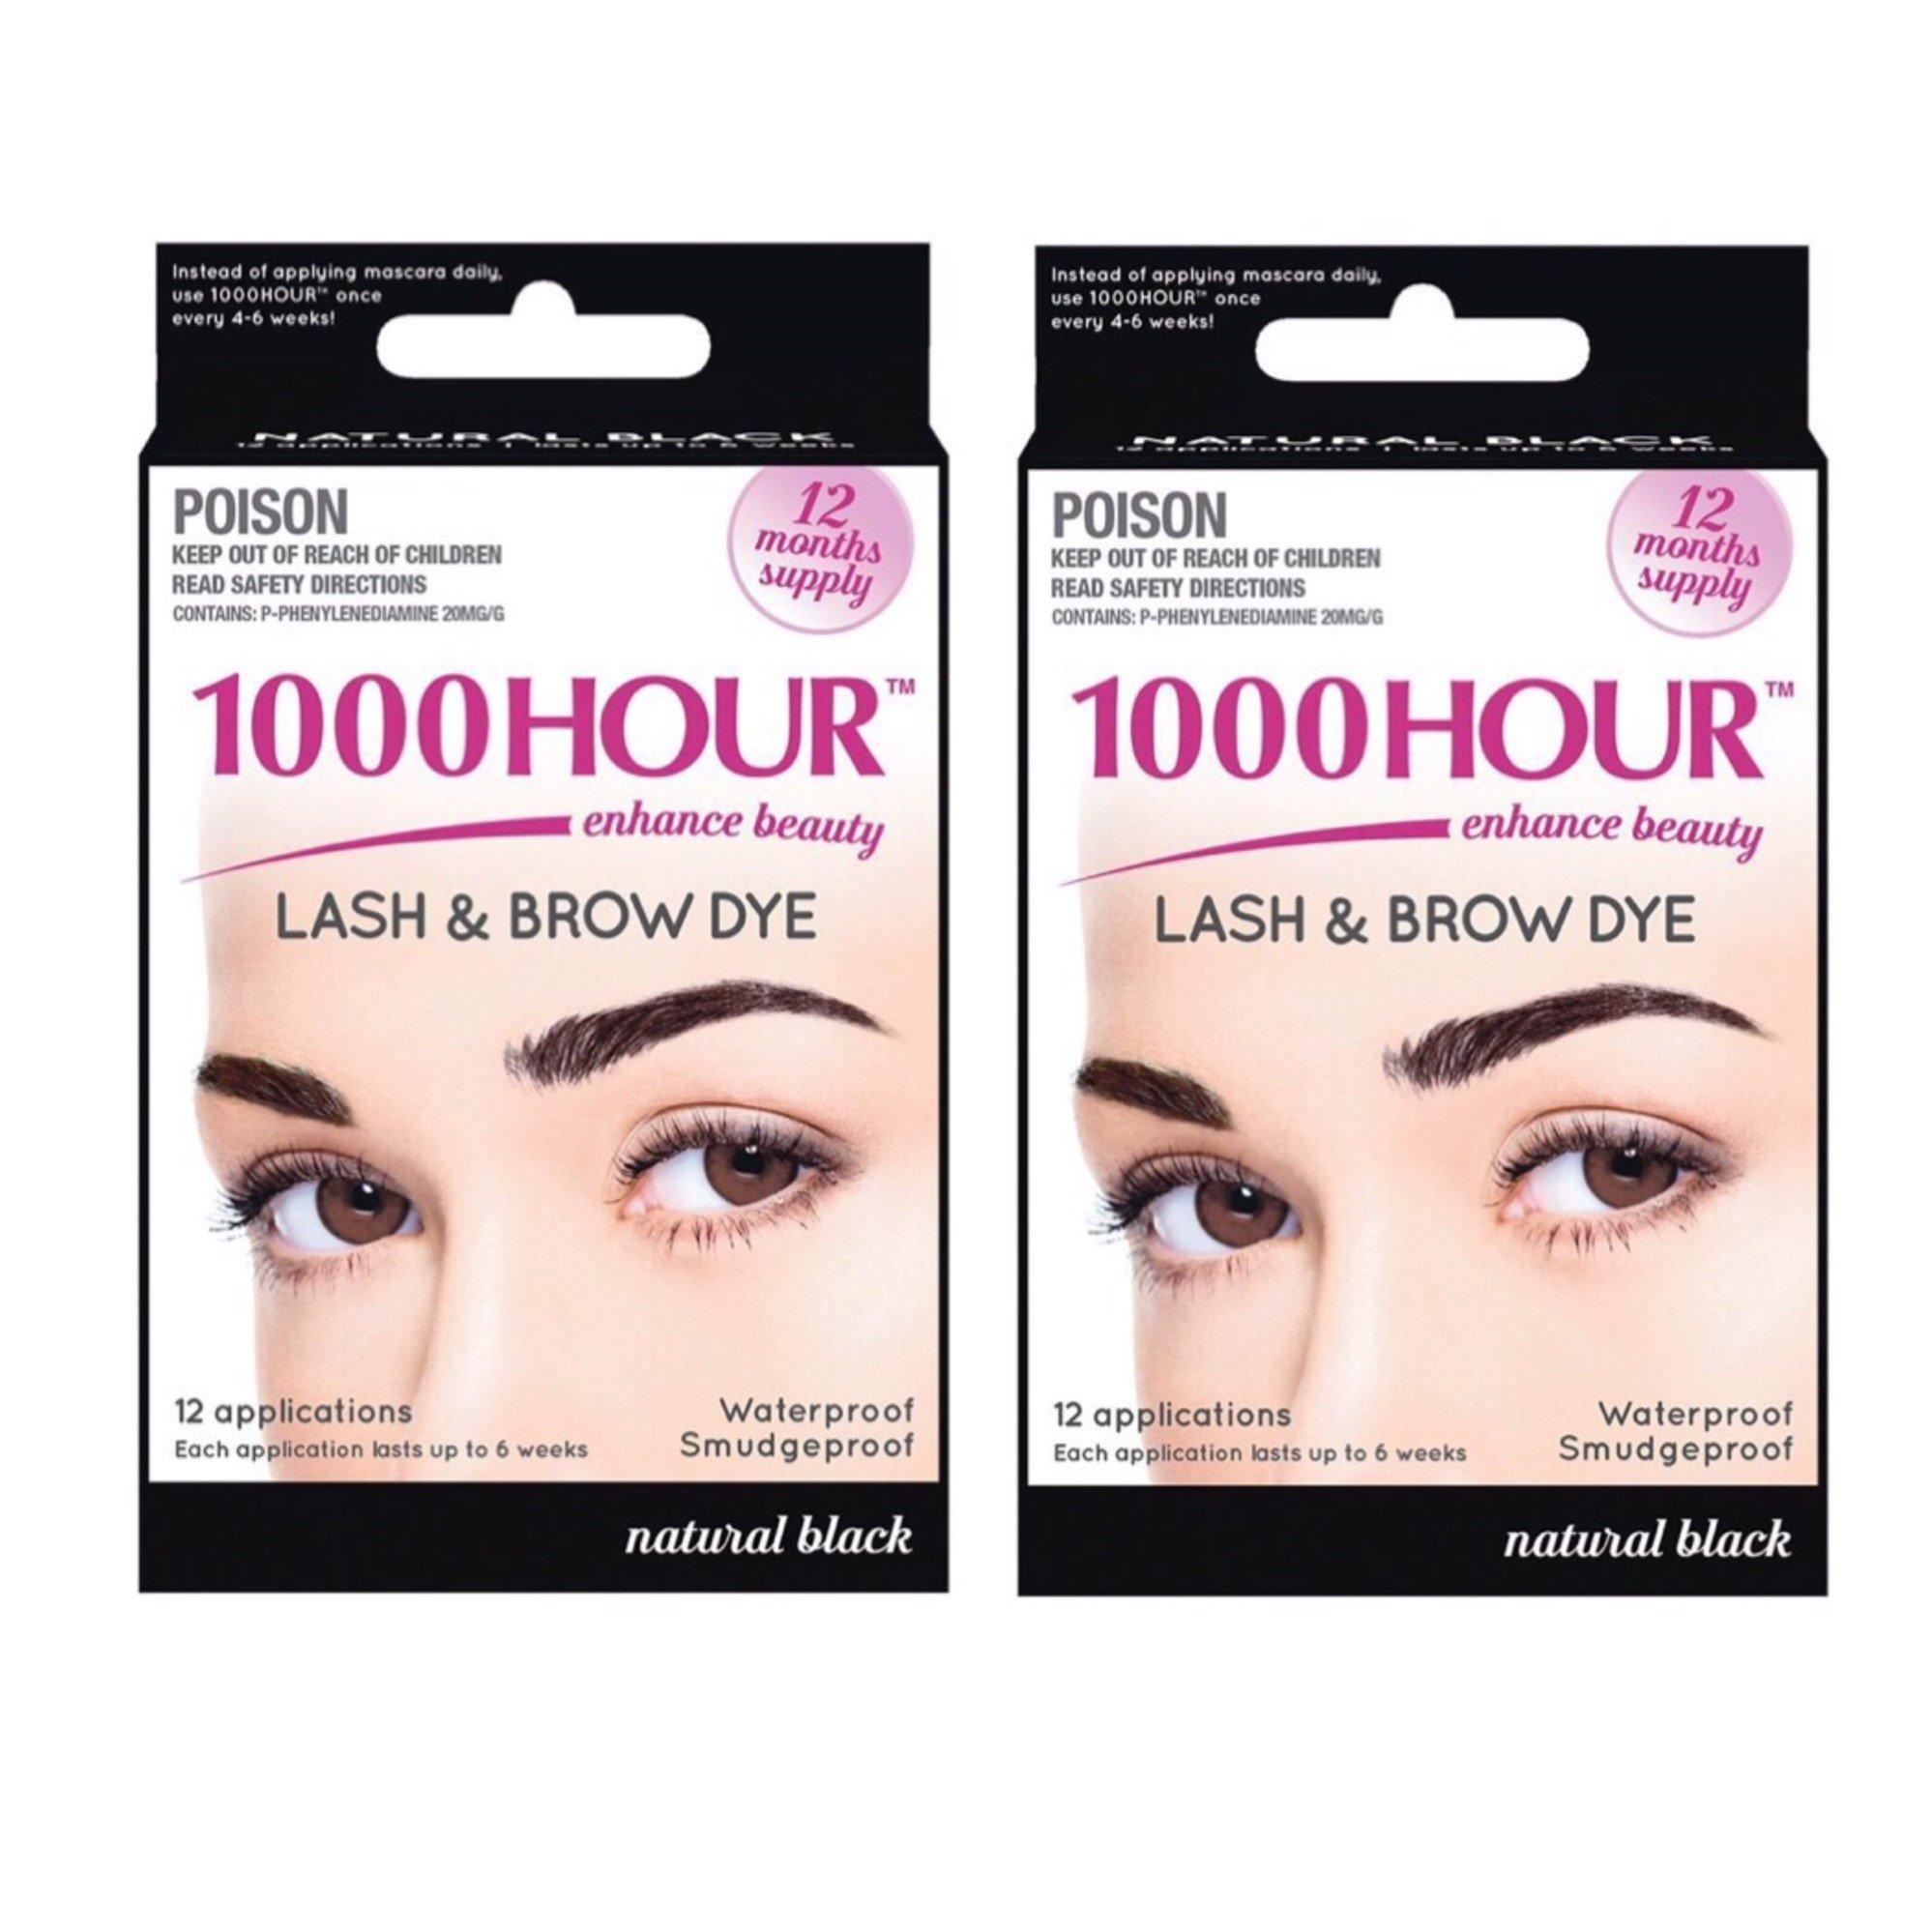 d27801d51f4 Amazon.com : 1000 Hour Eyelash & Brow Dye / Tint Kit Permanent Mascara  (Black) (2 Pack) : Beauty